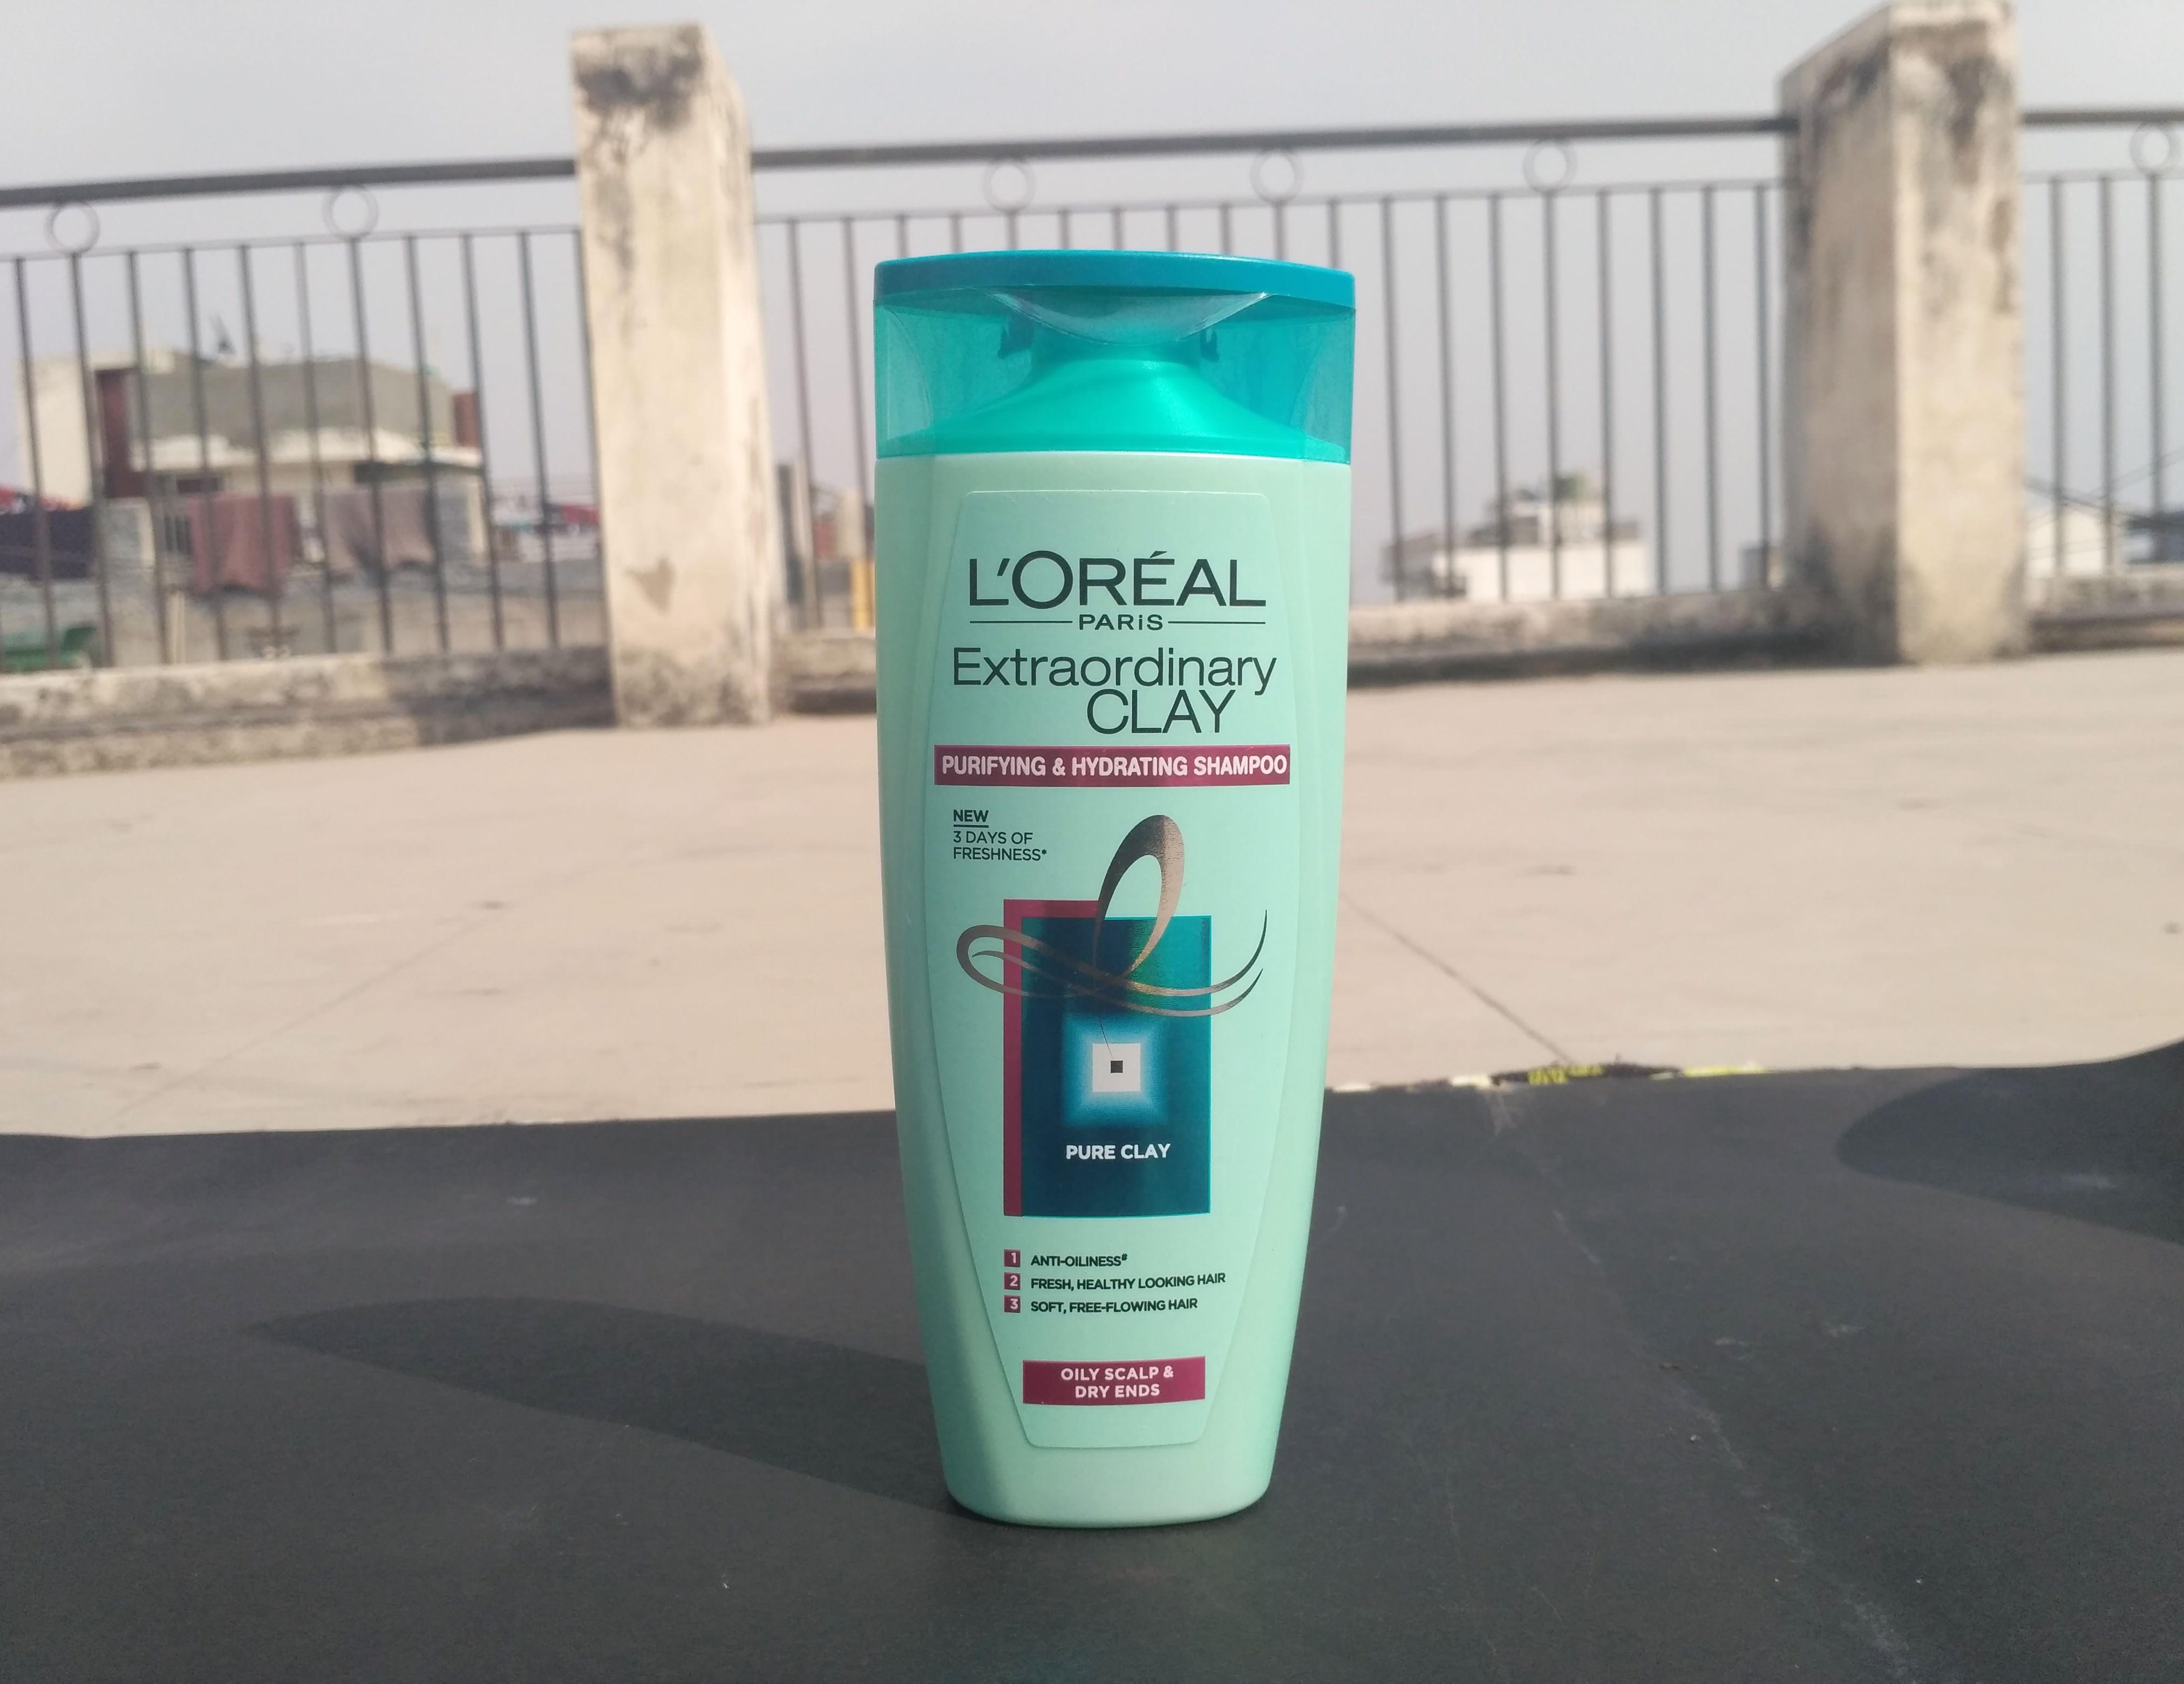 l'oreal paris extraordinary clay purifying & hydrating shampoo review